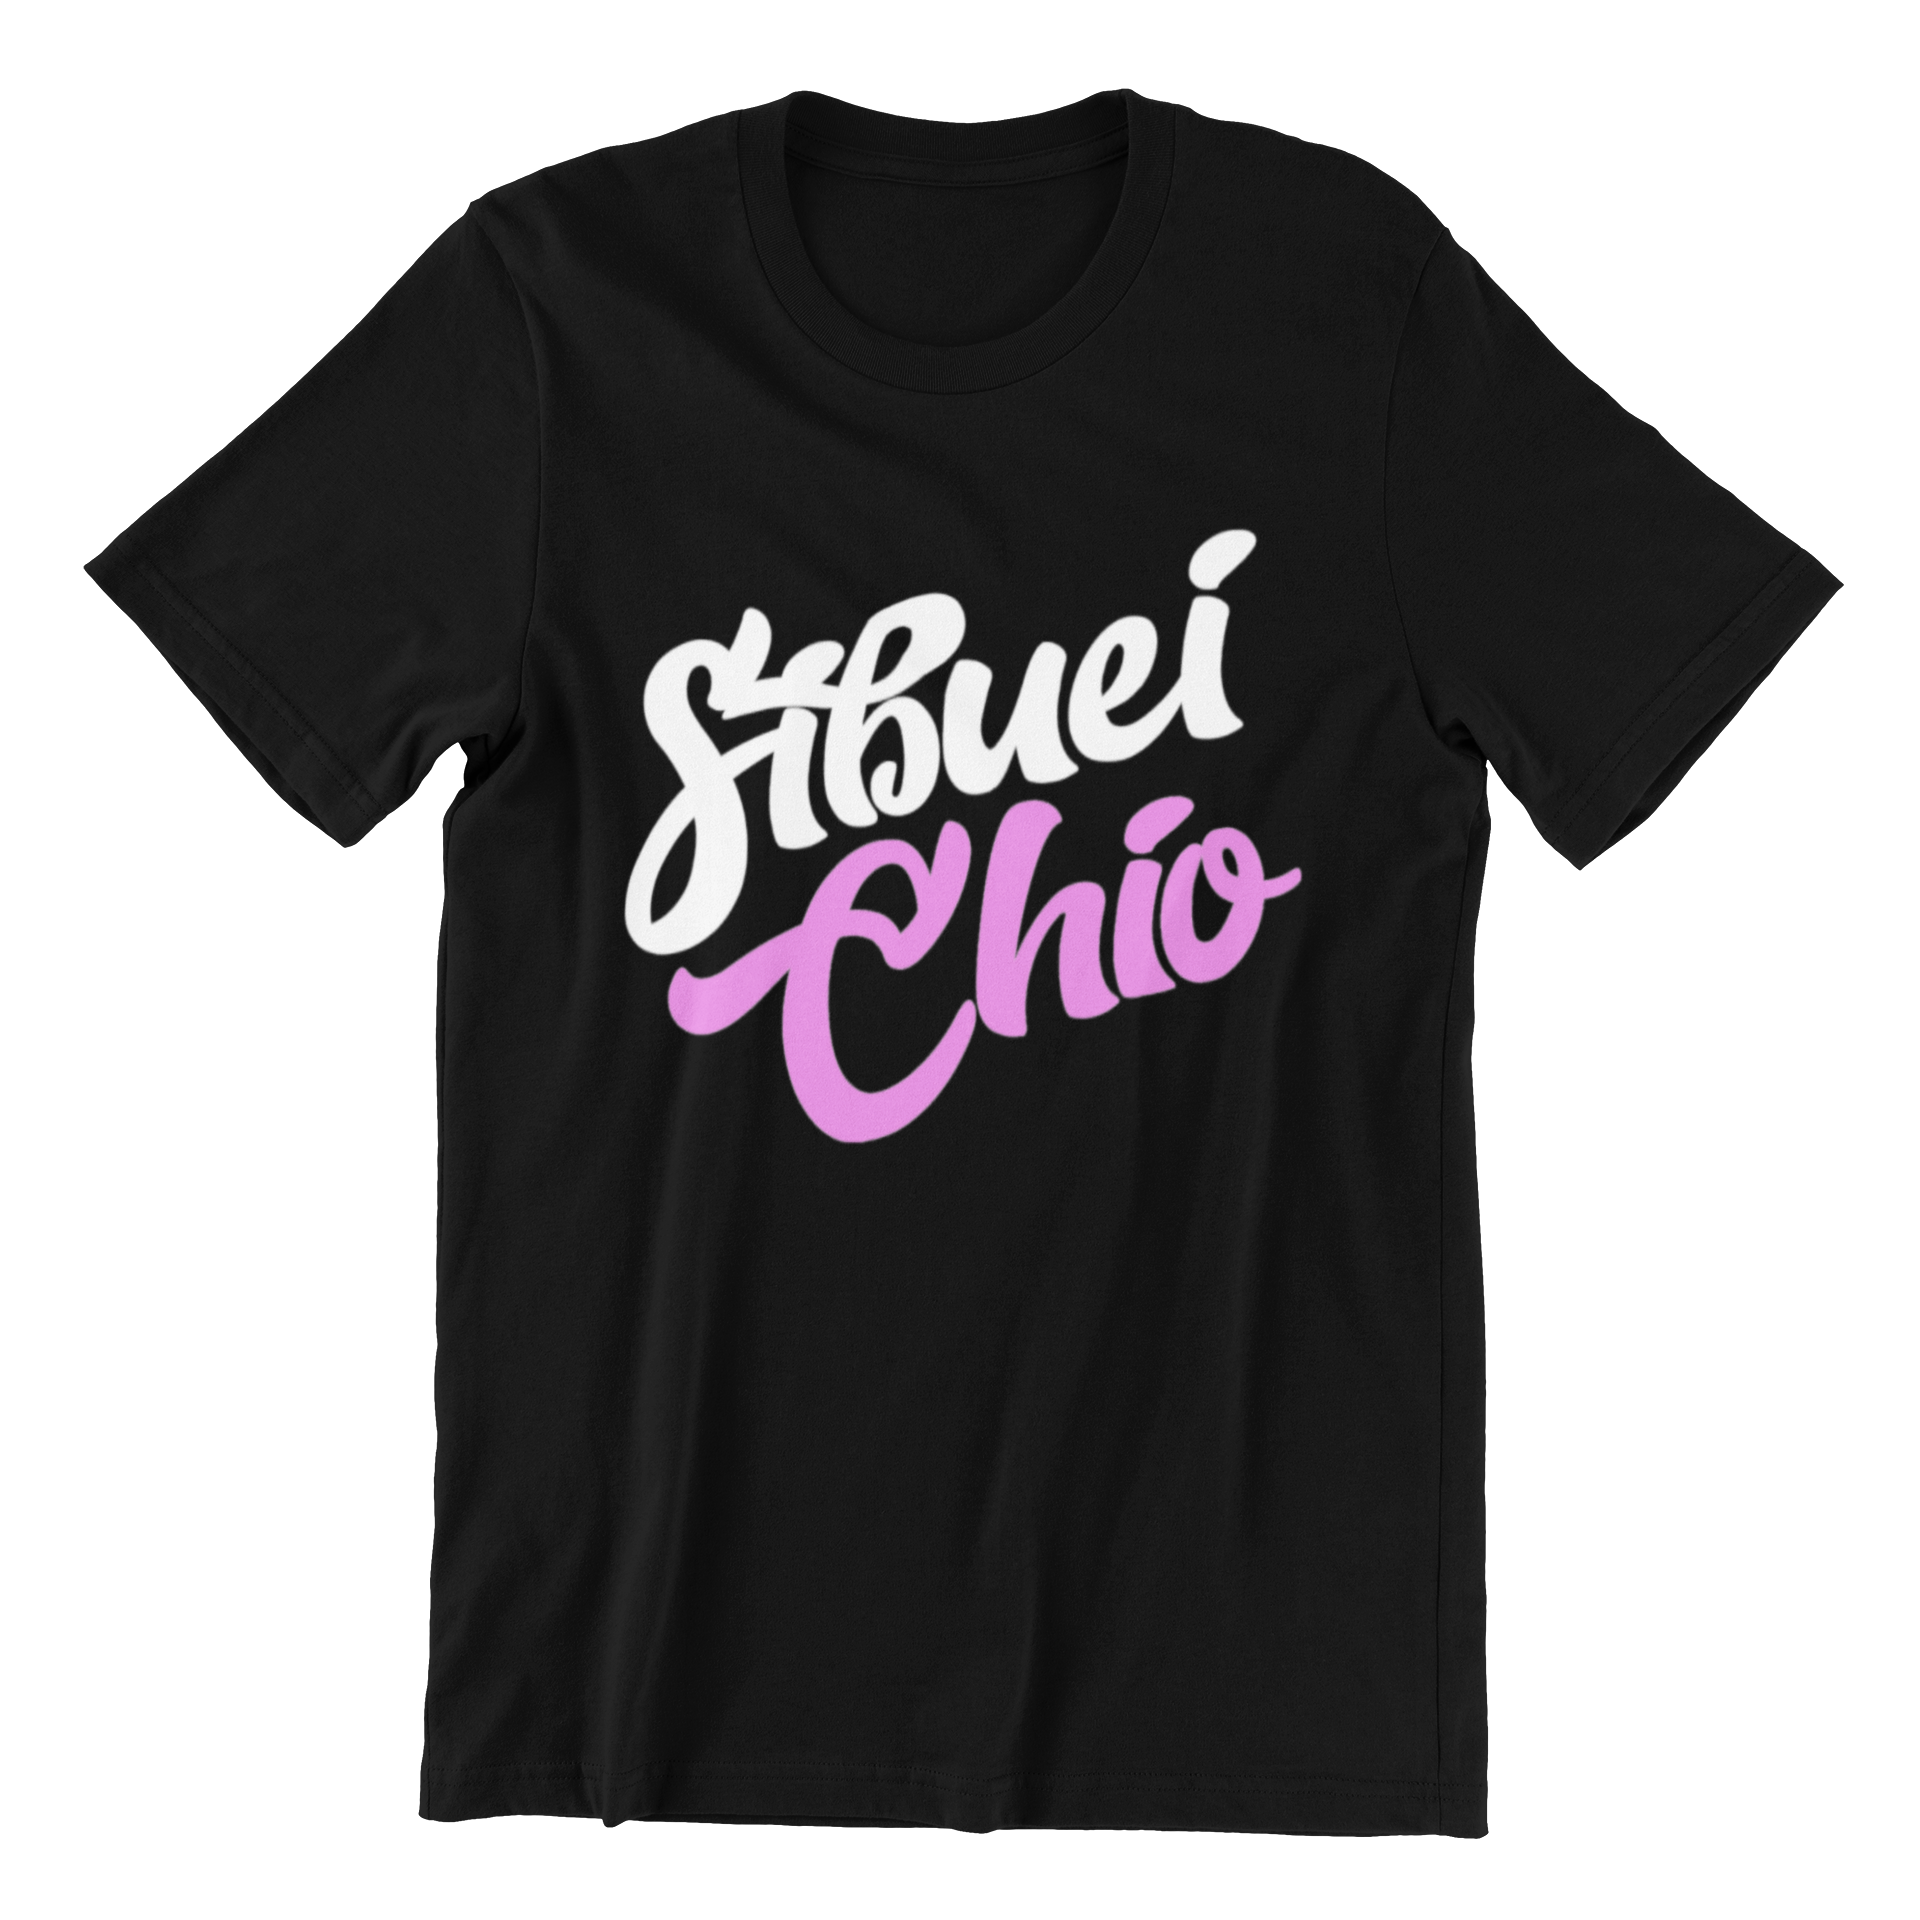 Sibuei Chio Crew Neck Short Sleeve T-shirt